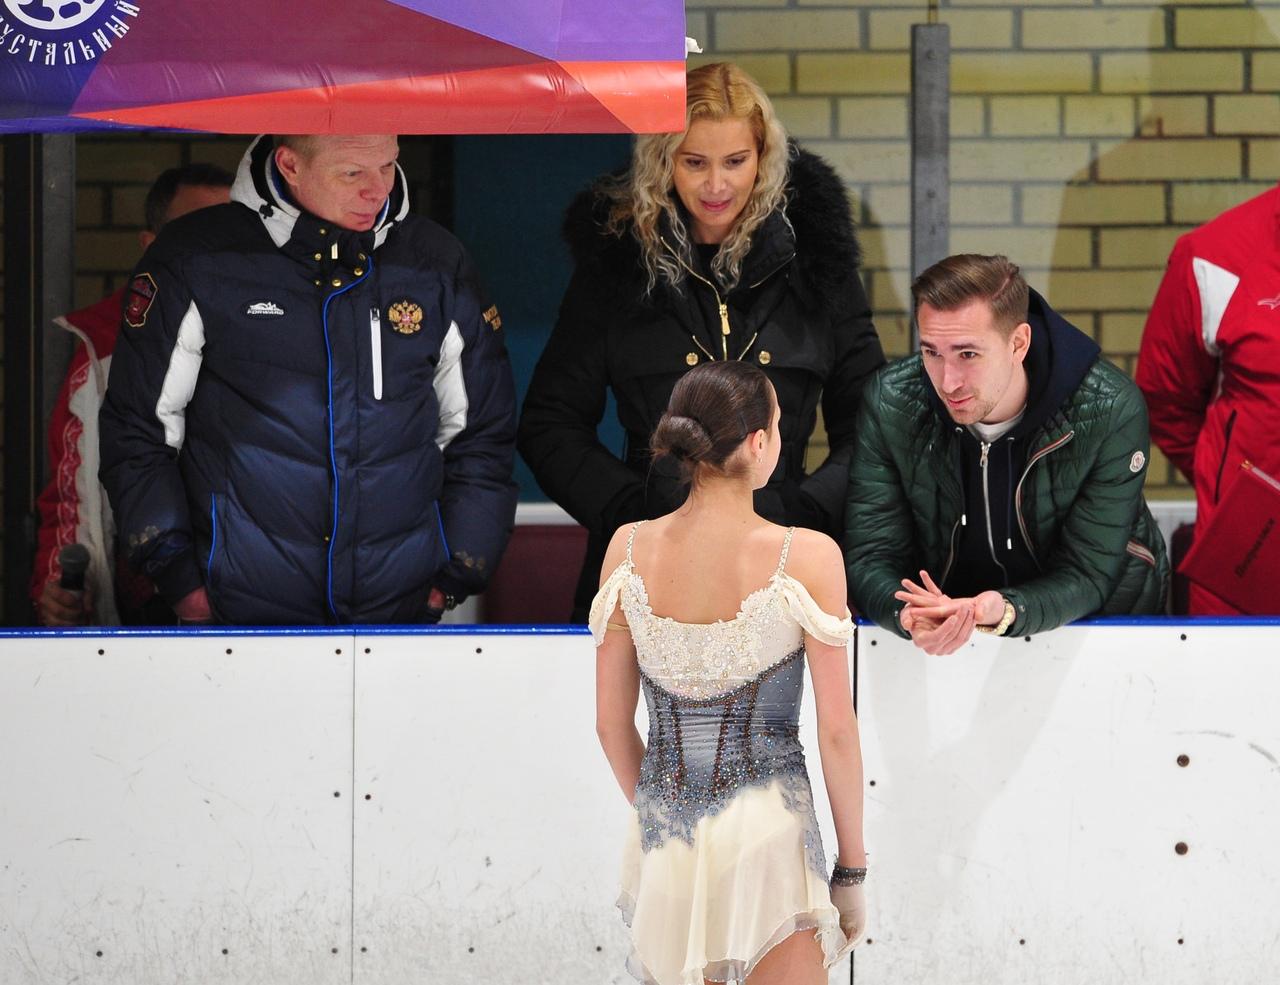 Алина Ильназовна Загитова-2 | Олимпийская чемпионка - Страница 6 RFteJdy4pB4